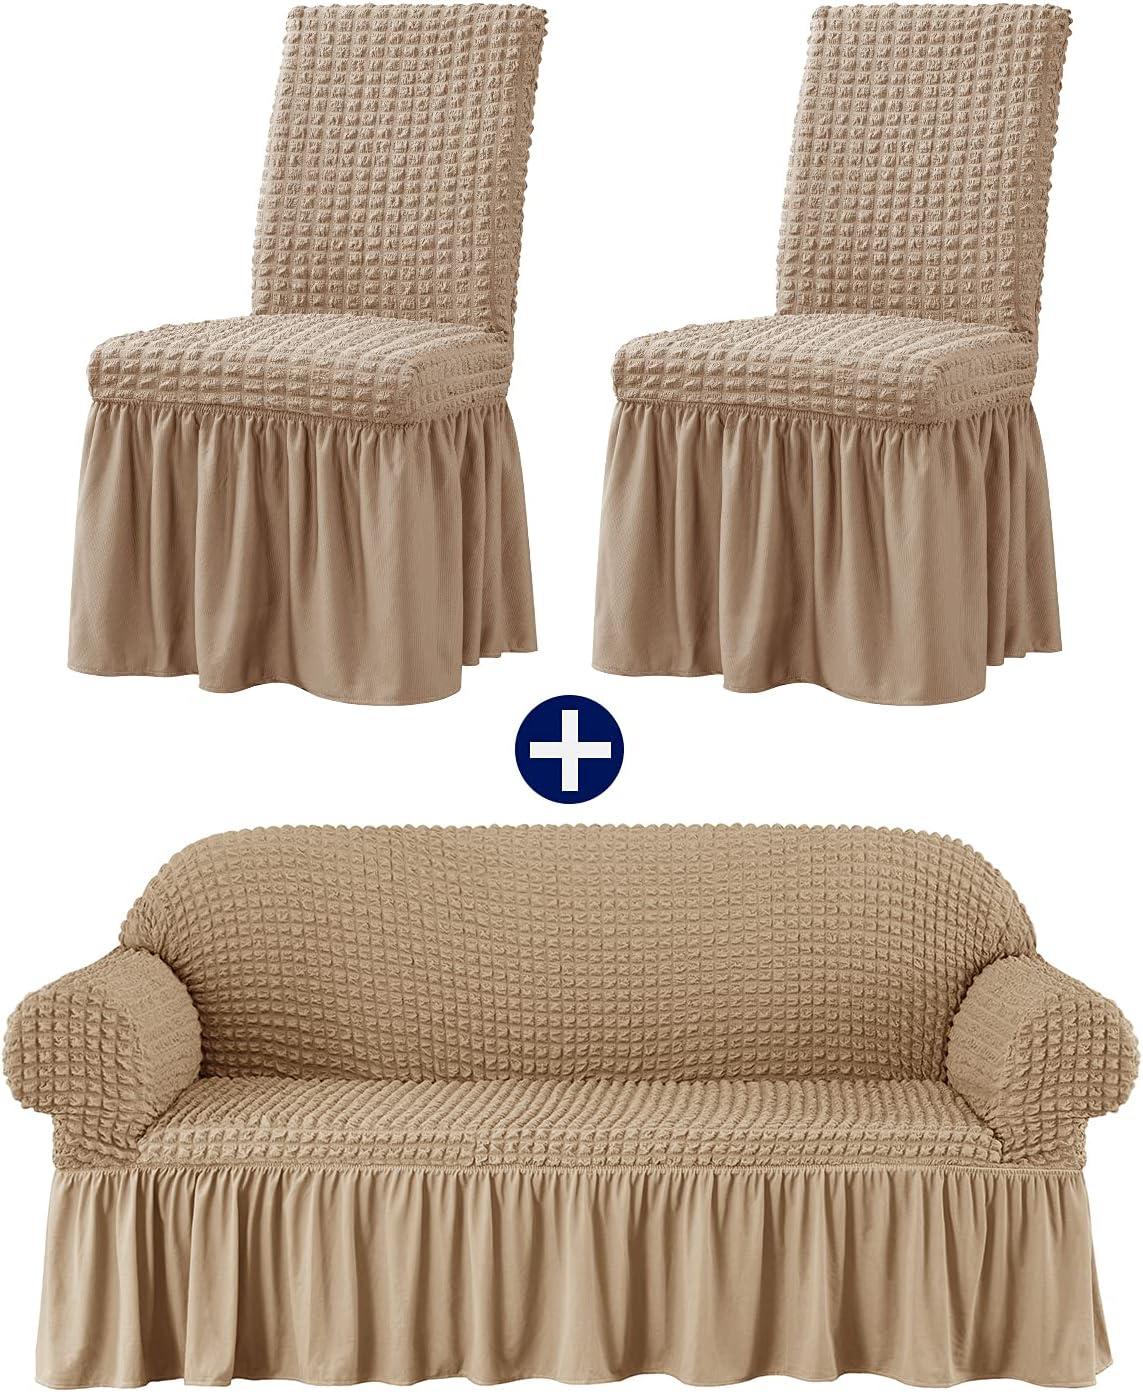 subrtex Ranking TOP3 List price Oatmeal Dining Chair Slipcover Bundles Seersucke